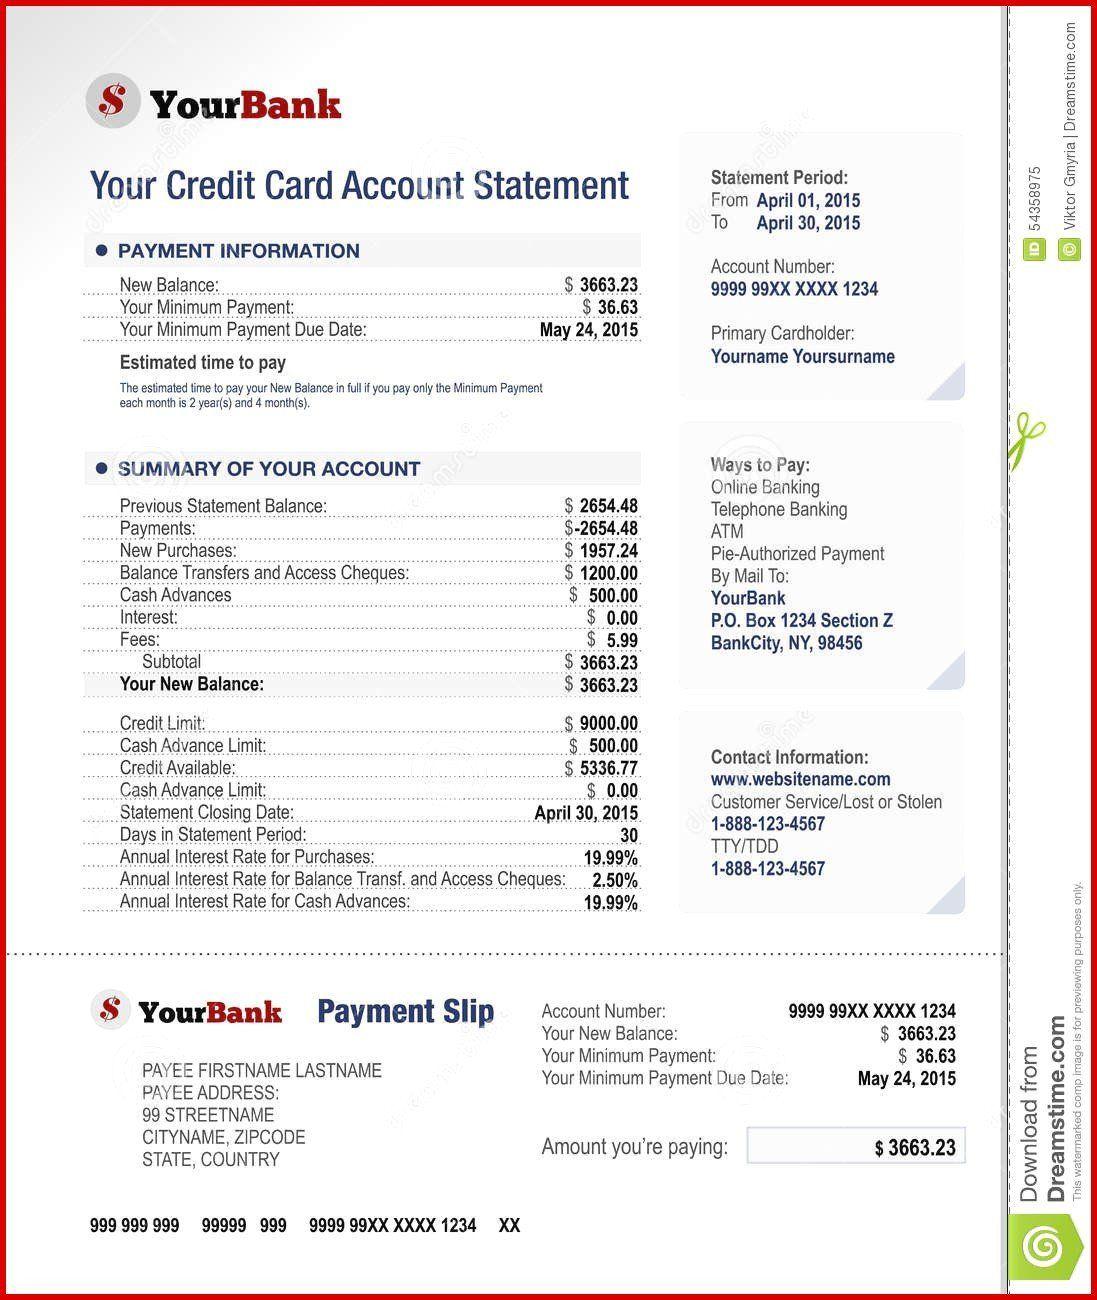 Create Fake Bank Statement Template Fake Bank Account Statement Creator Statement Template Bank Statement Chase Bank Create fake bank statement template